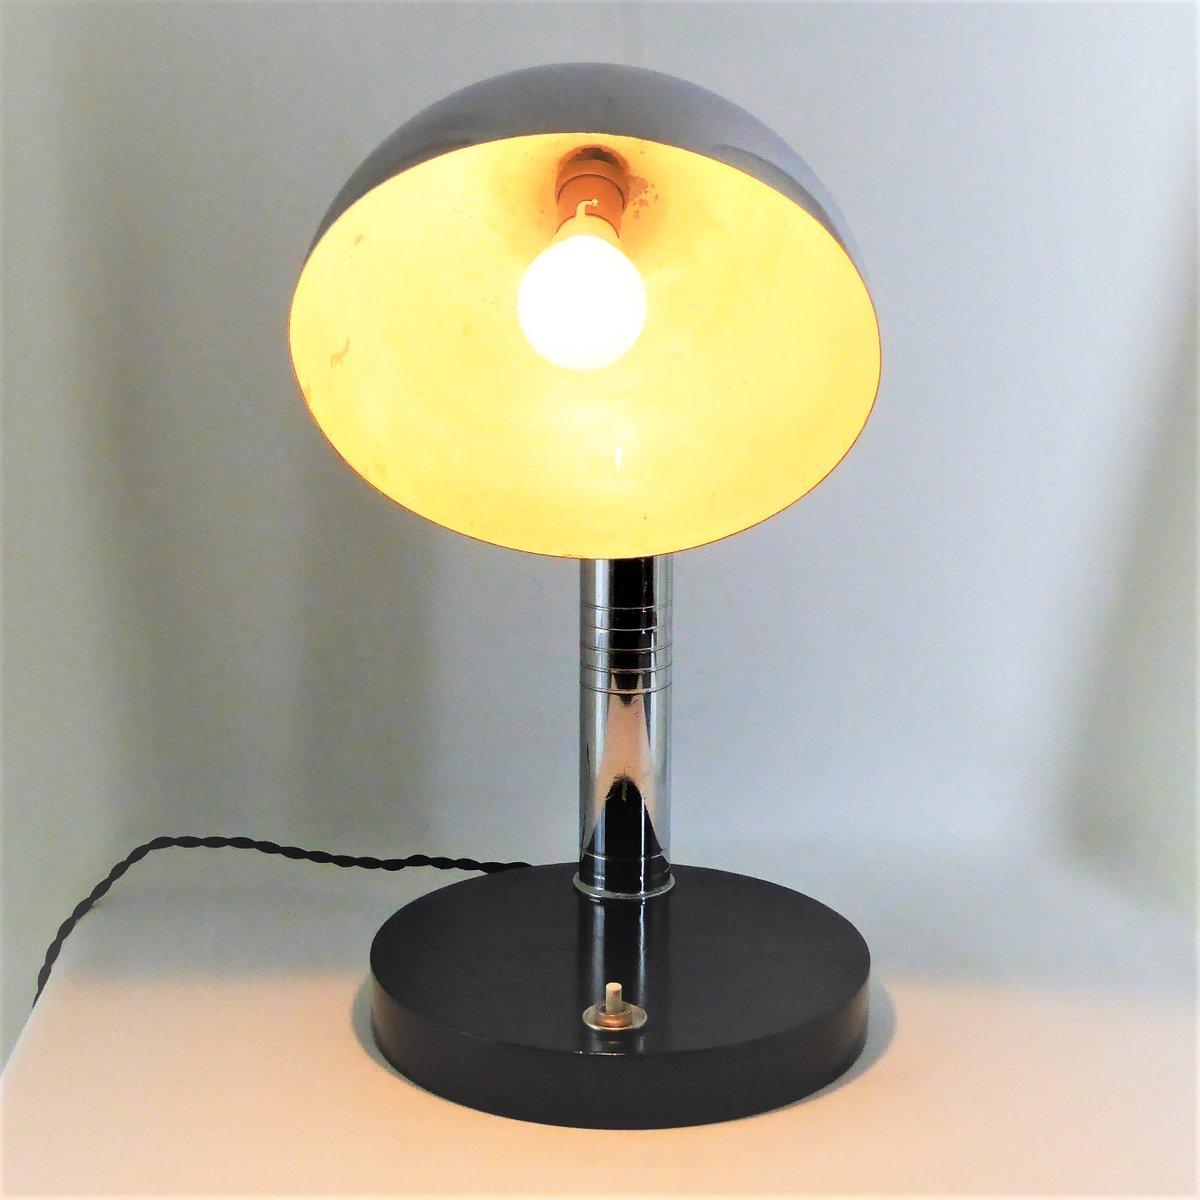 verchromte art deco tischlampe 1930er bei pamono kaufen. Black Bedroom Furniture Sets. Home Design Ideas